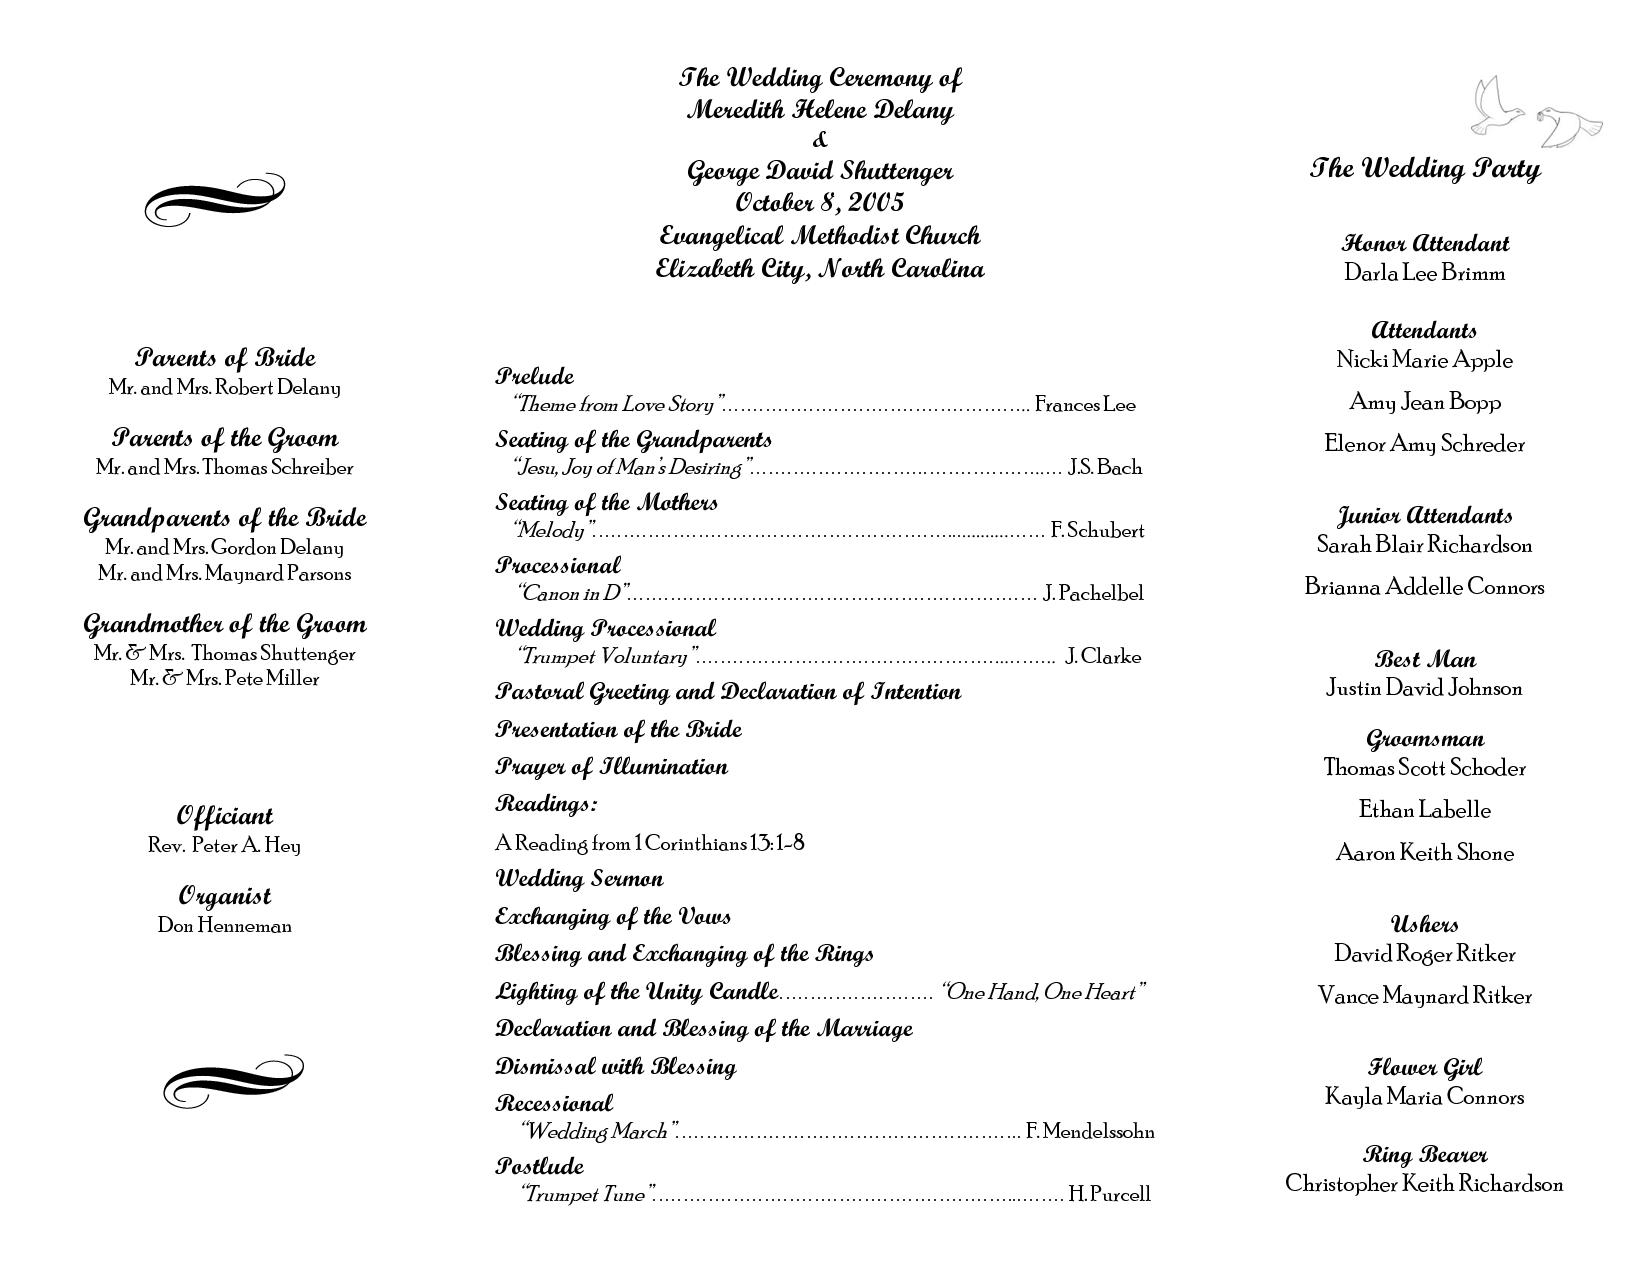 Free Printable Wedding Programs Templates | Wedding Program Sample - Free Printable Wedding Program Templates Word